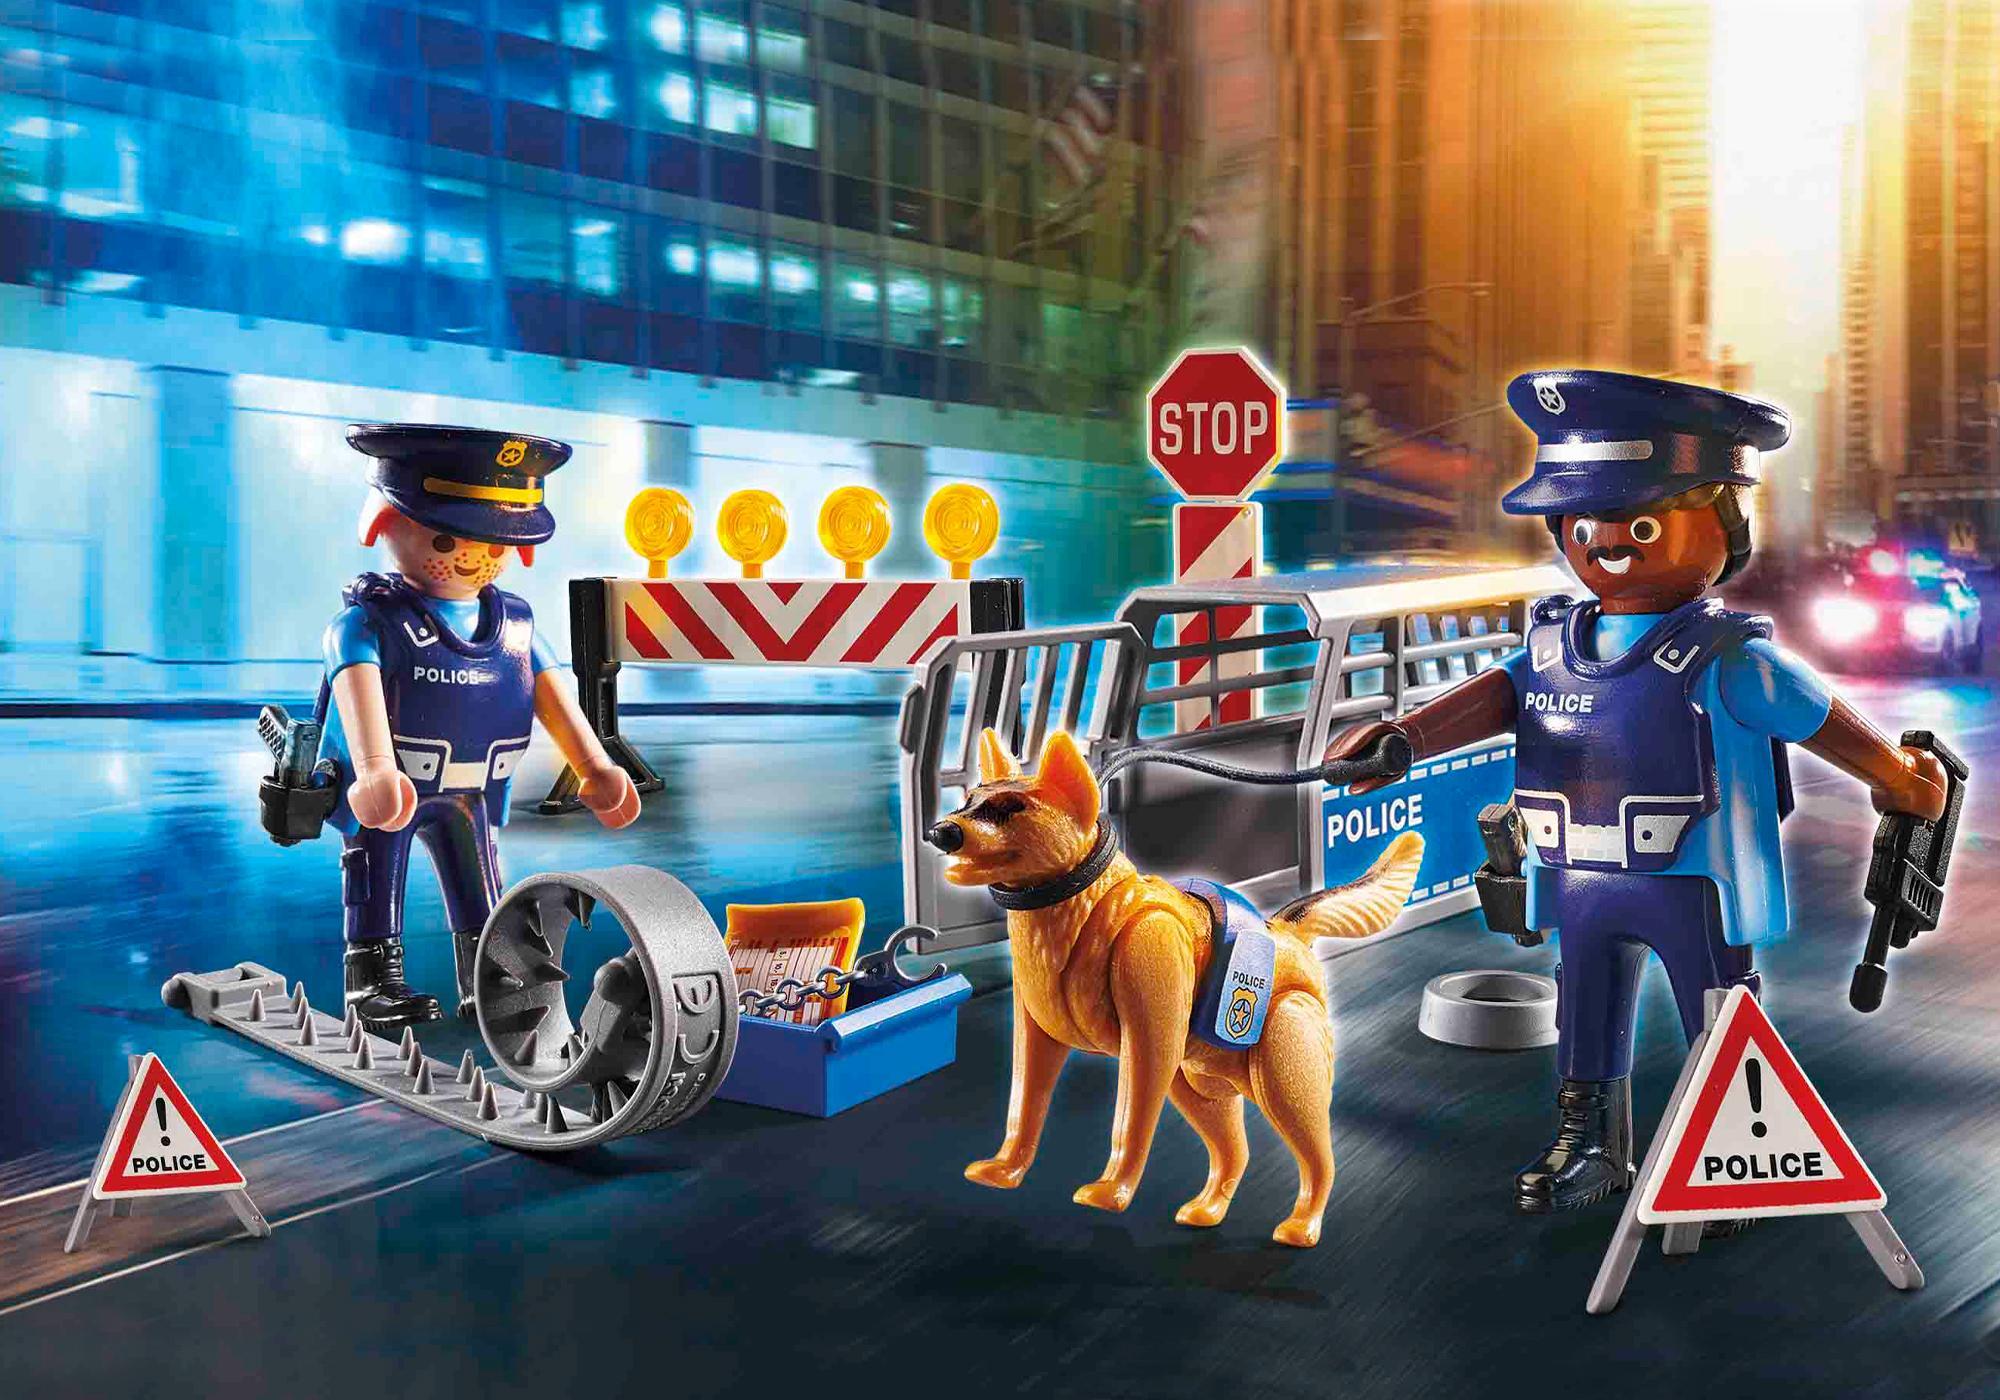 http://media.playmobil.com/i/playmobil/6878_product_detail/Police Roadblock